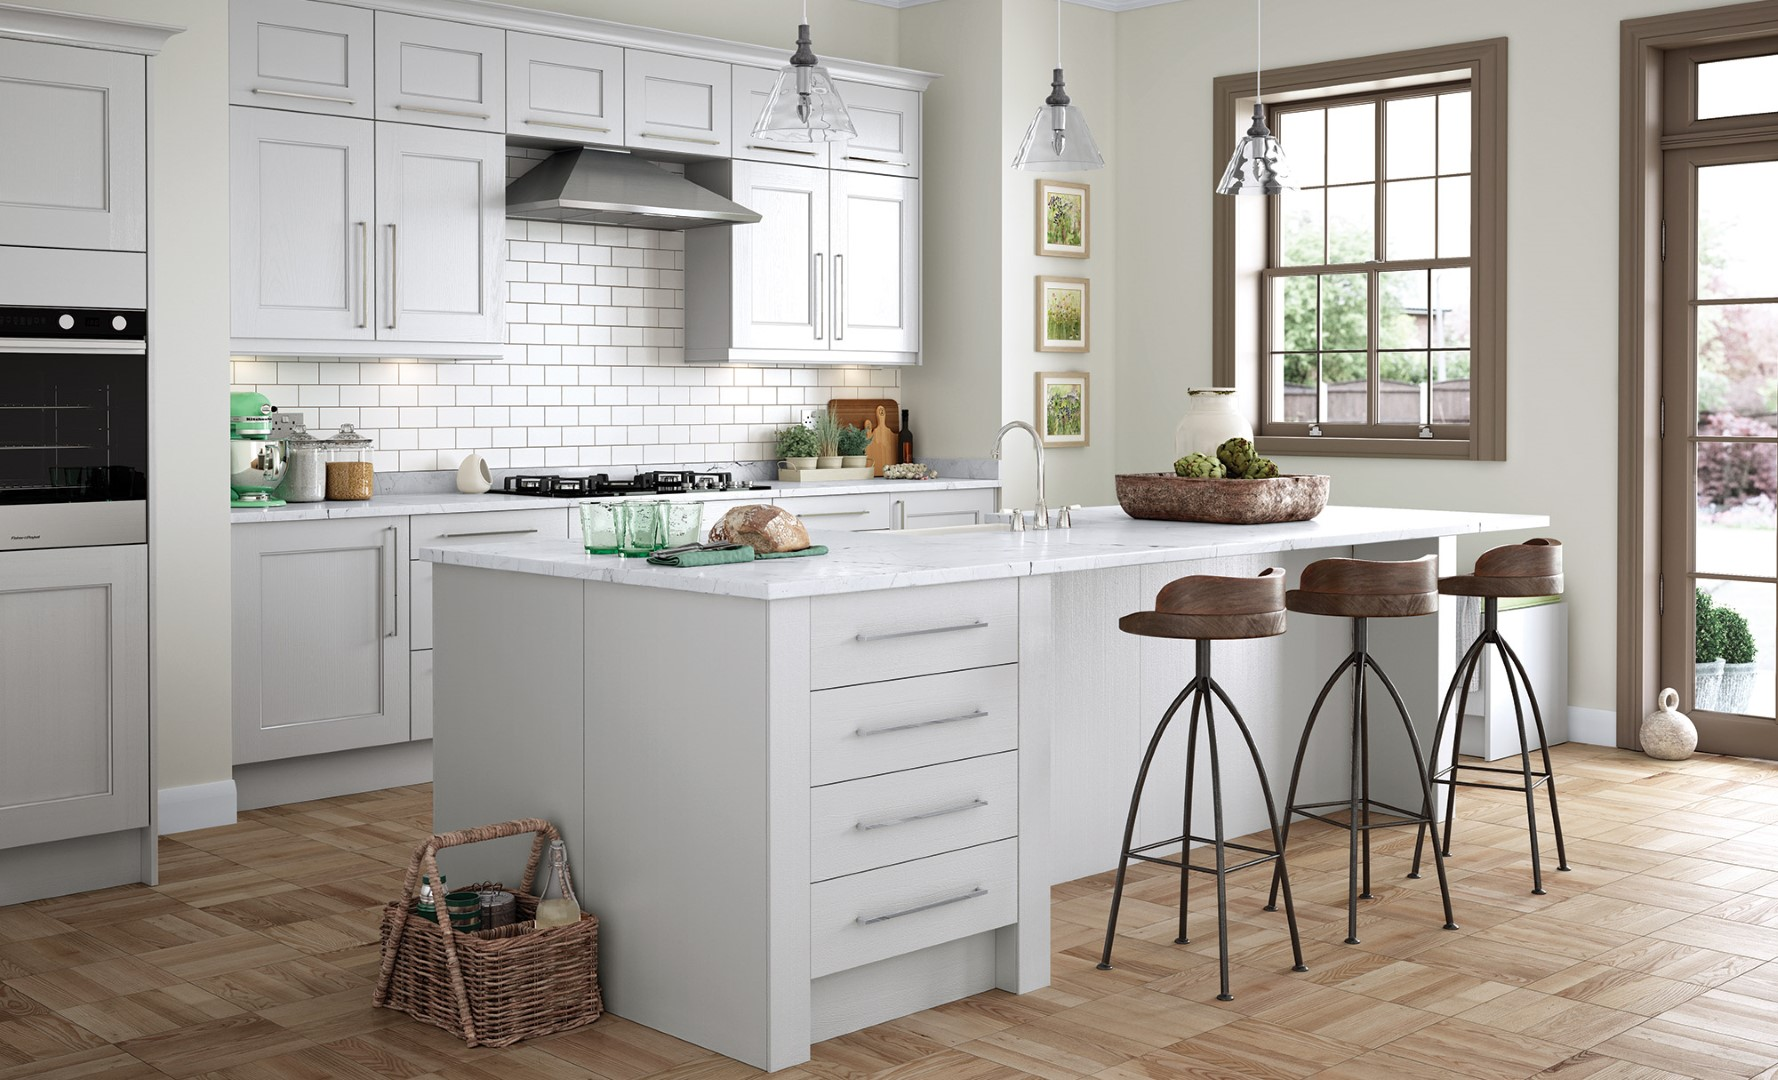 Wakefield Painted Light Grey Kitchen - Kitchen Design - Alan Kelly Kitchens - Waterford